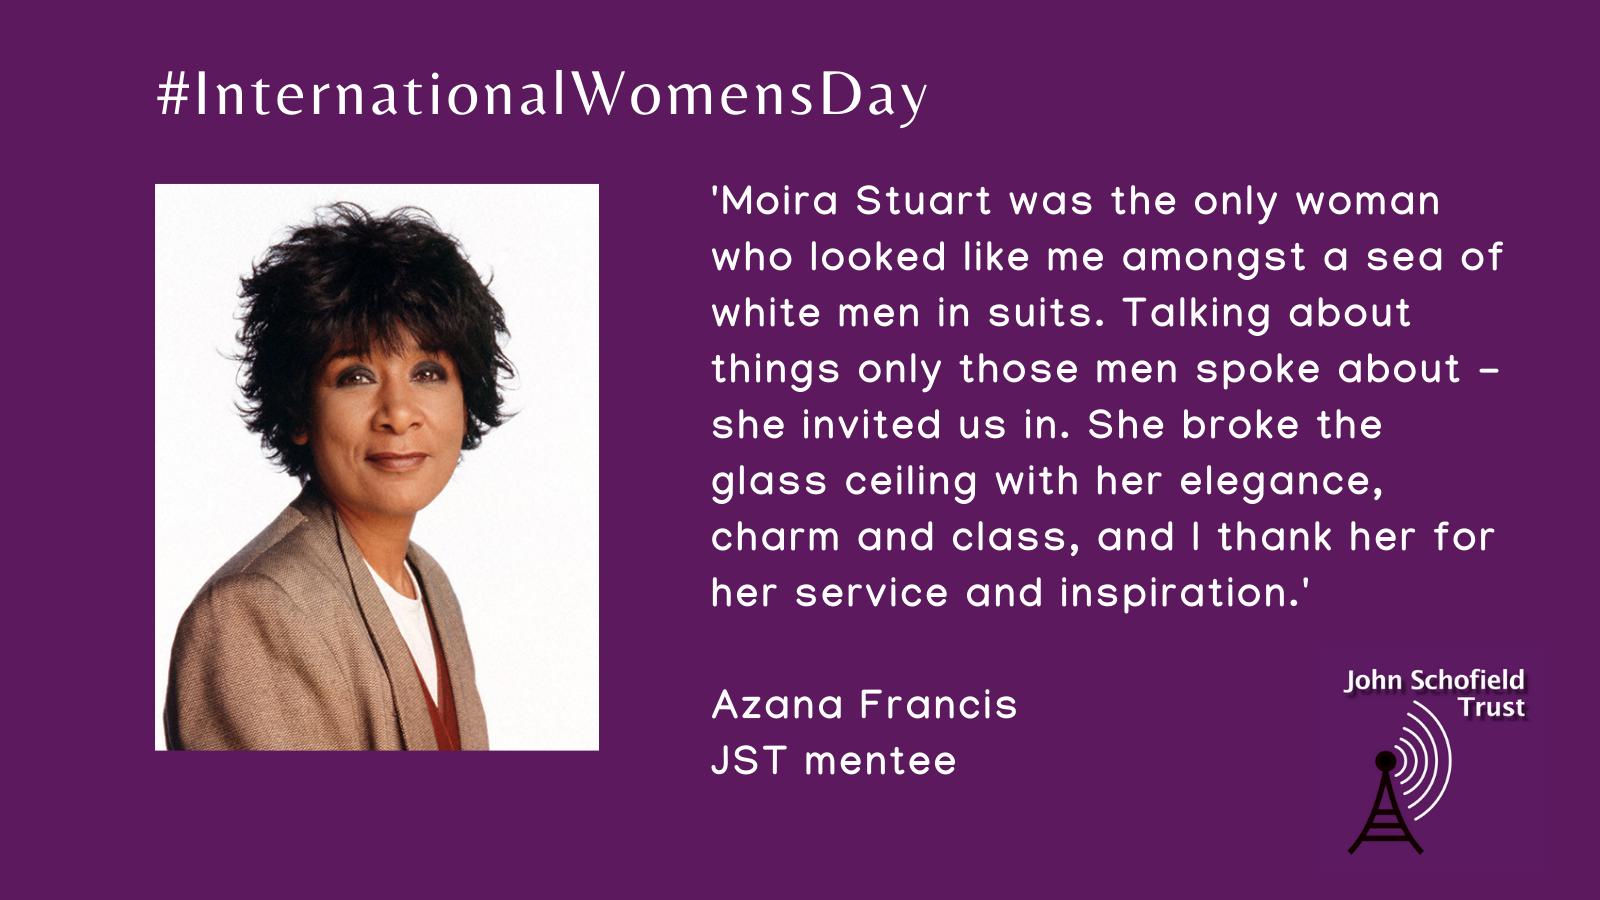 Azana Francis's inspirational woman, Moira Stuart